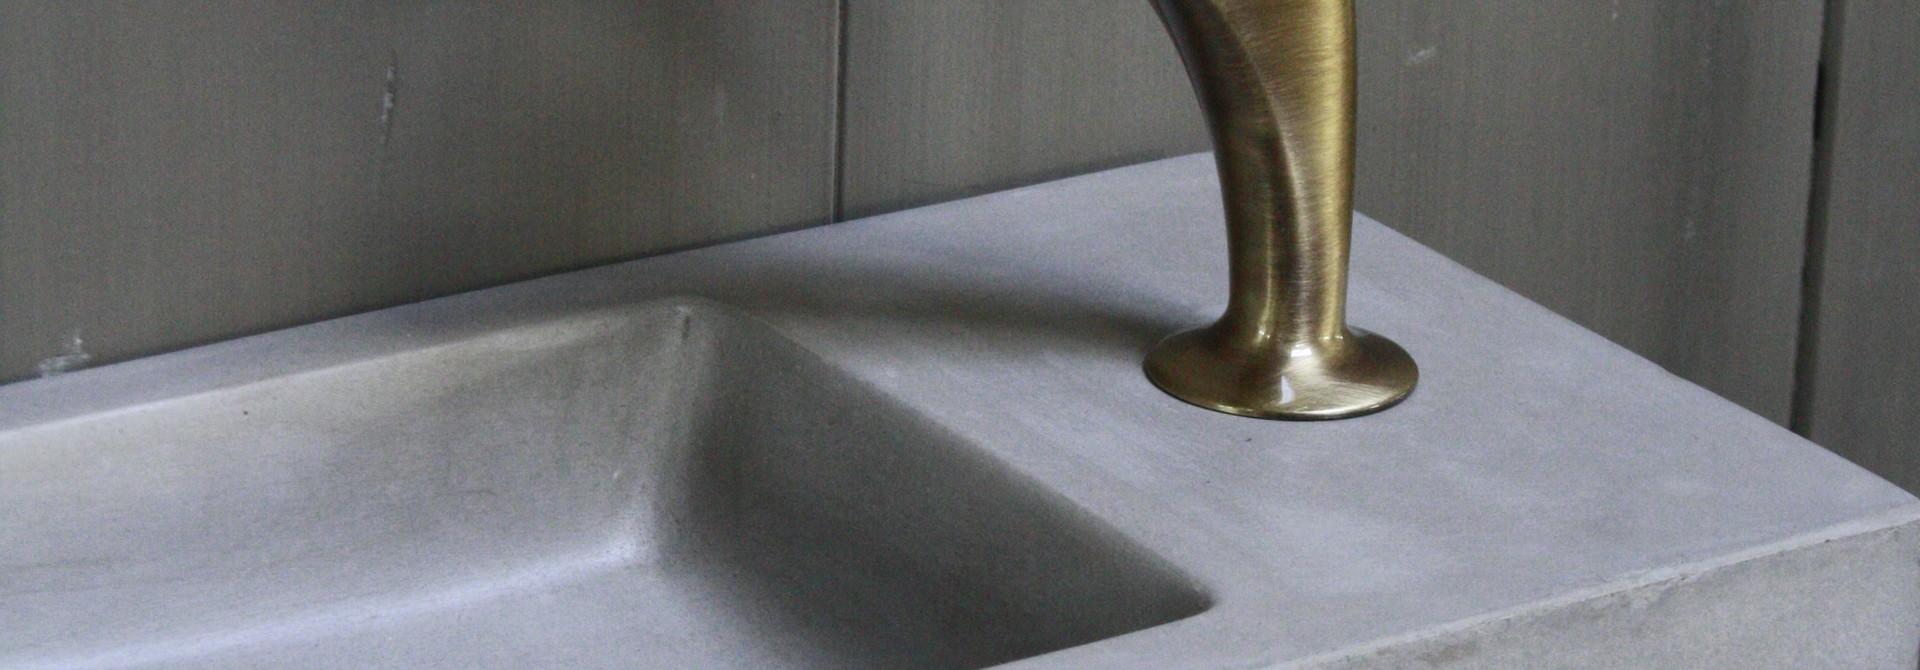 Accessoires Toilet of Badkamer